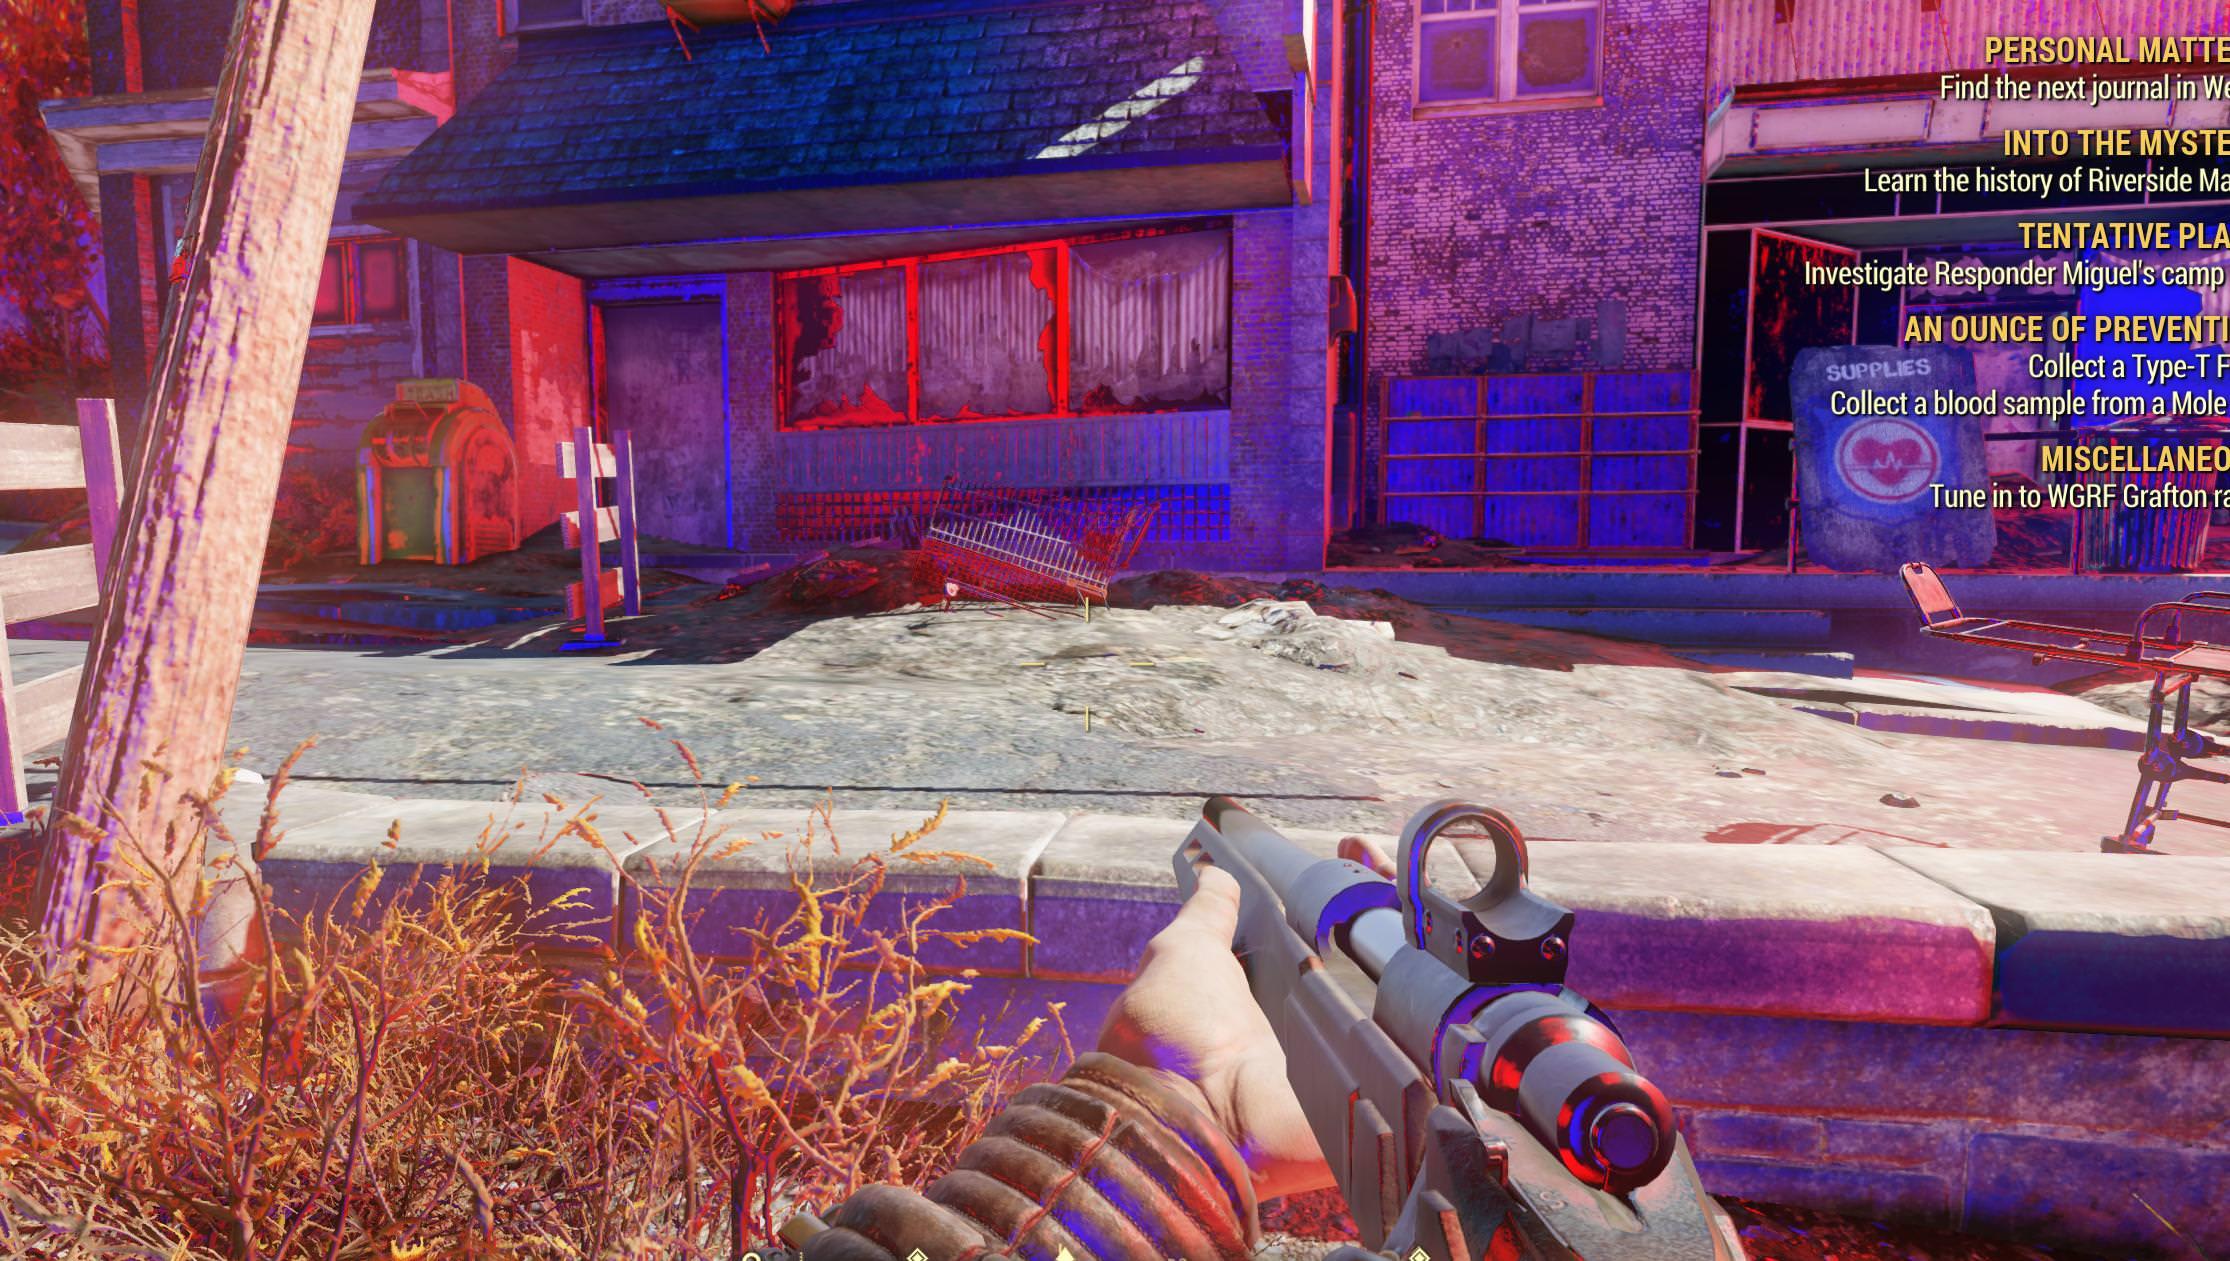 Fallout 76] Strange Colors · Issue #779 · doitsujin/dxvk · GitHub